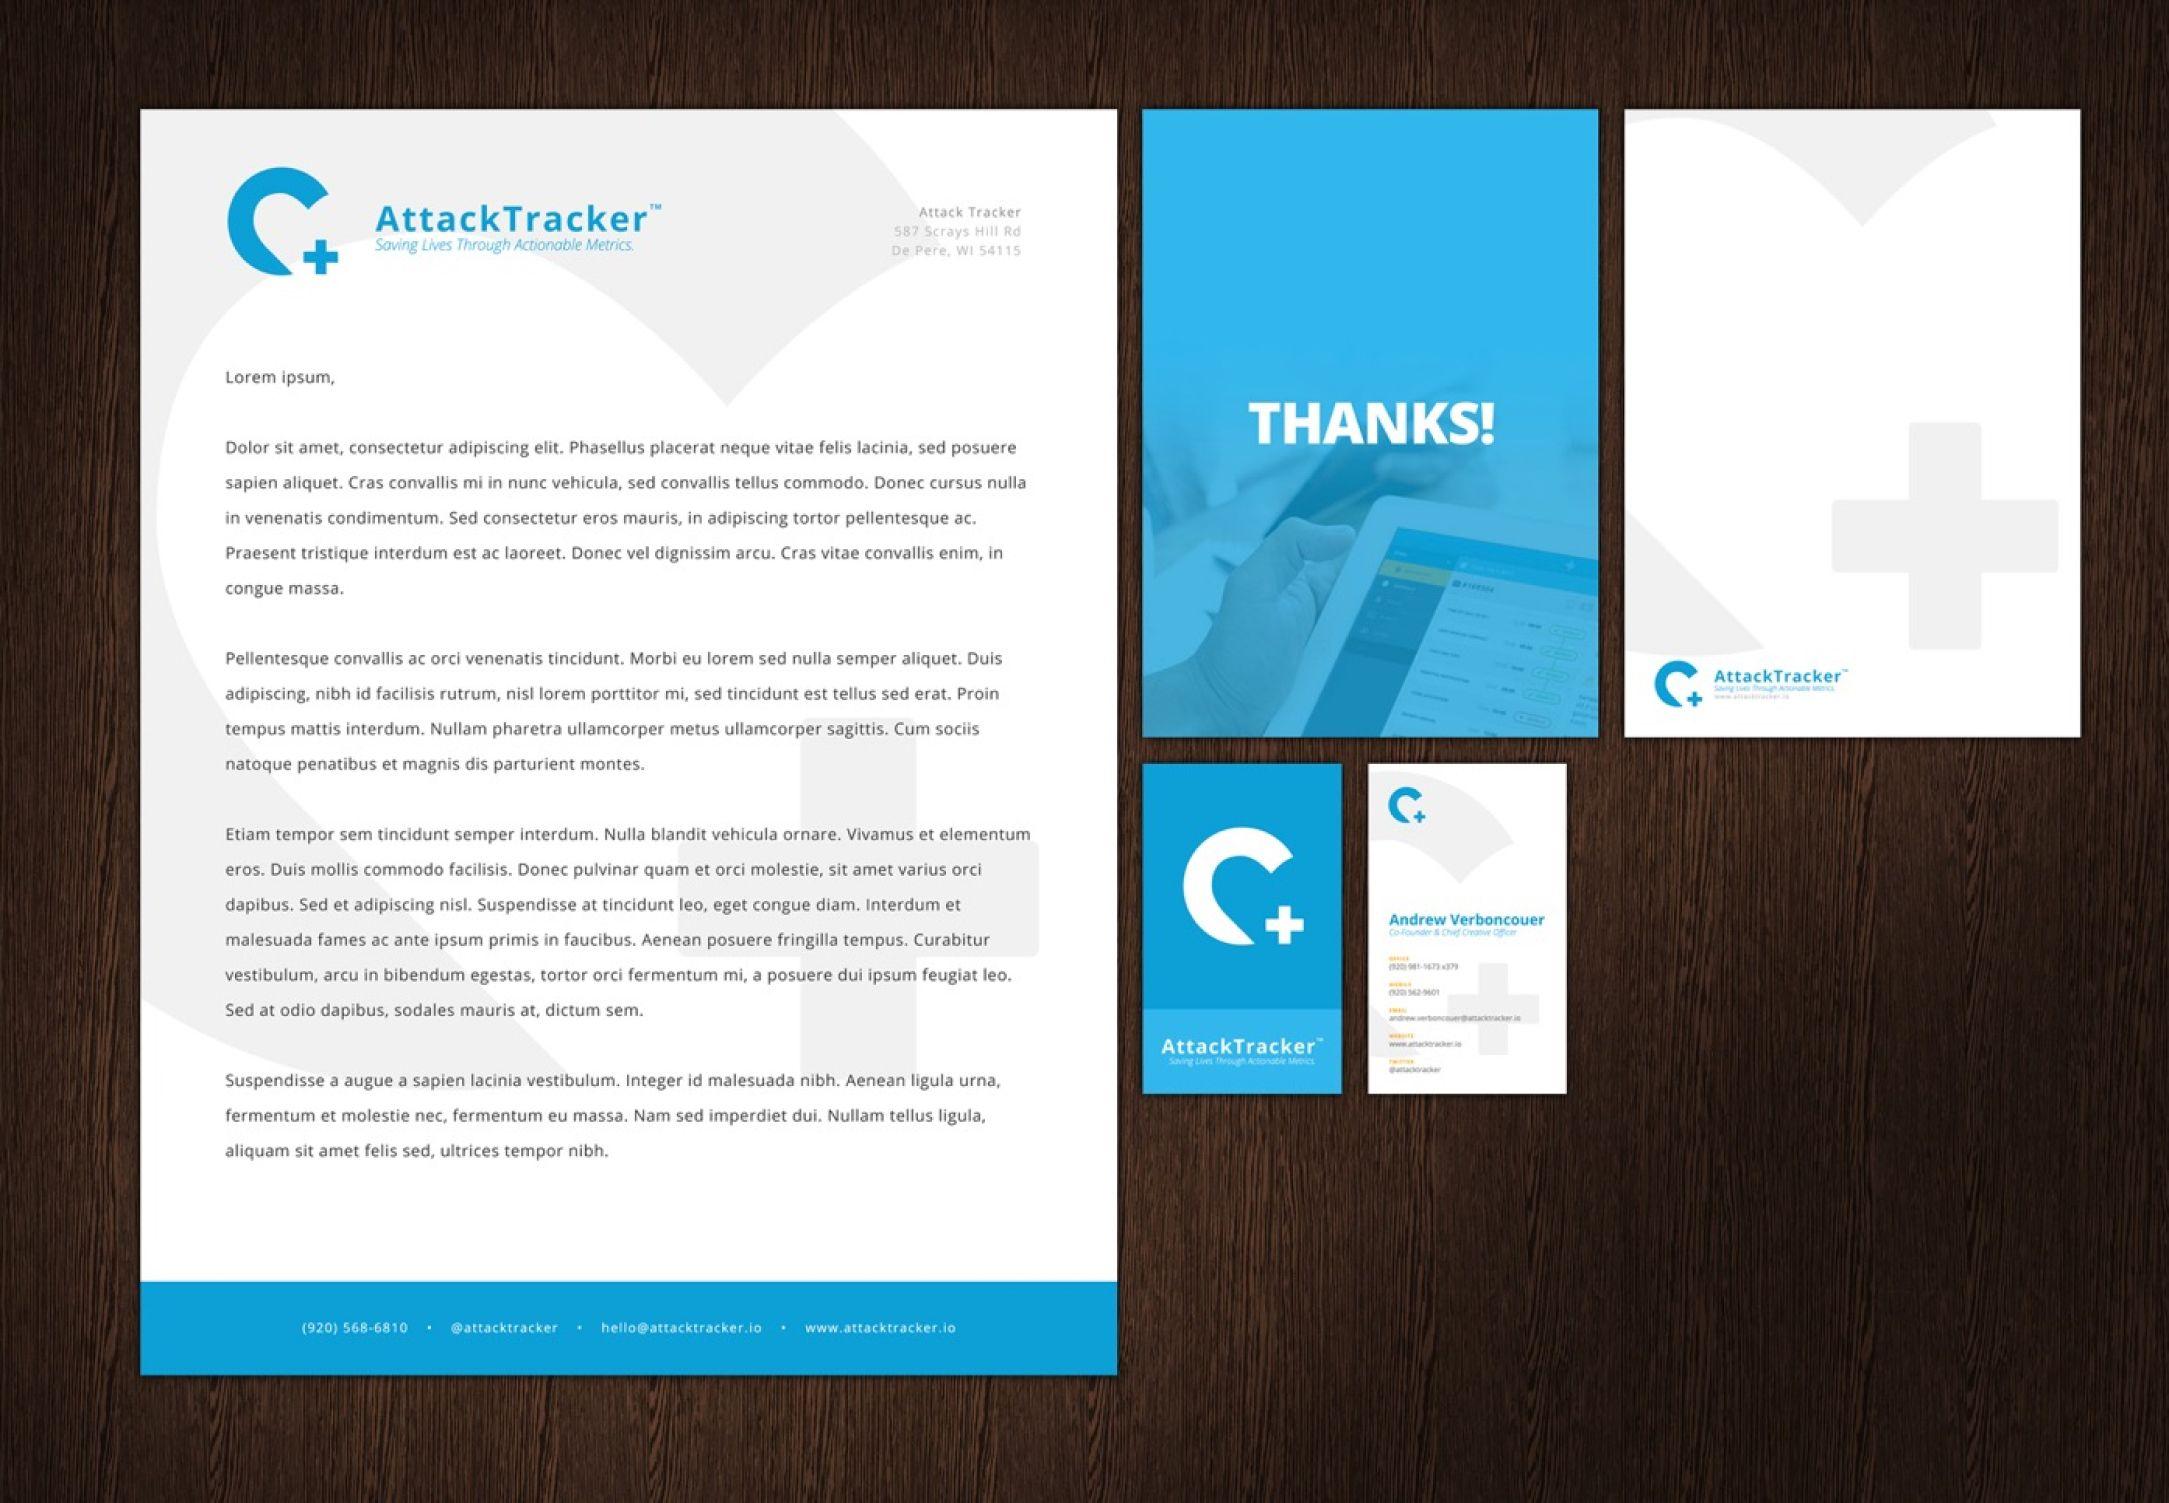 AttackTracker branded identity package